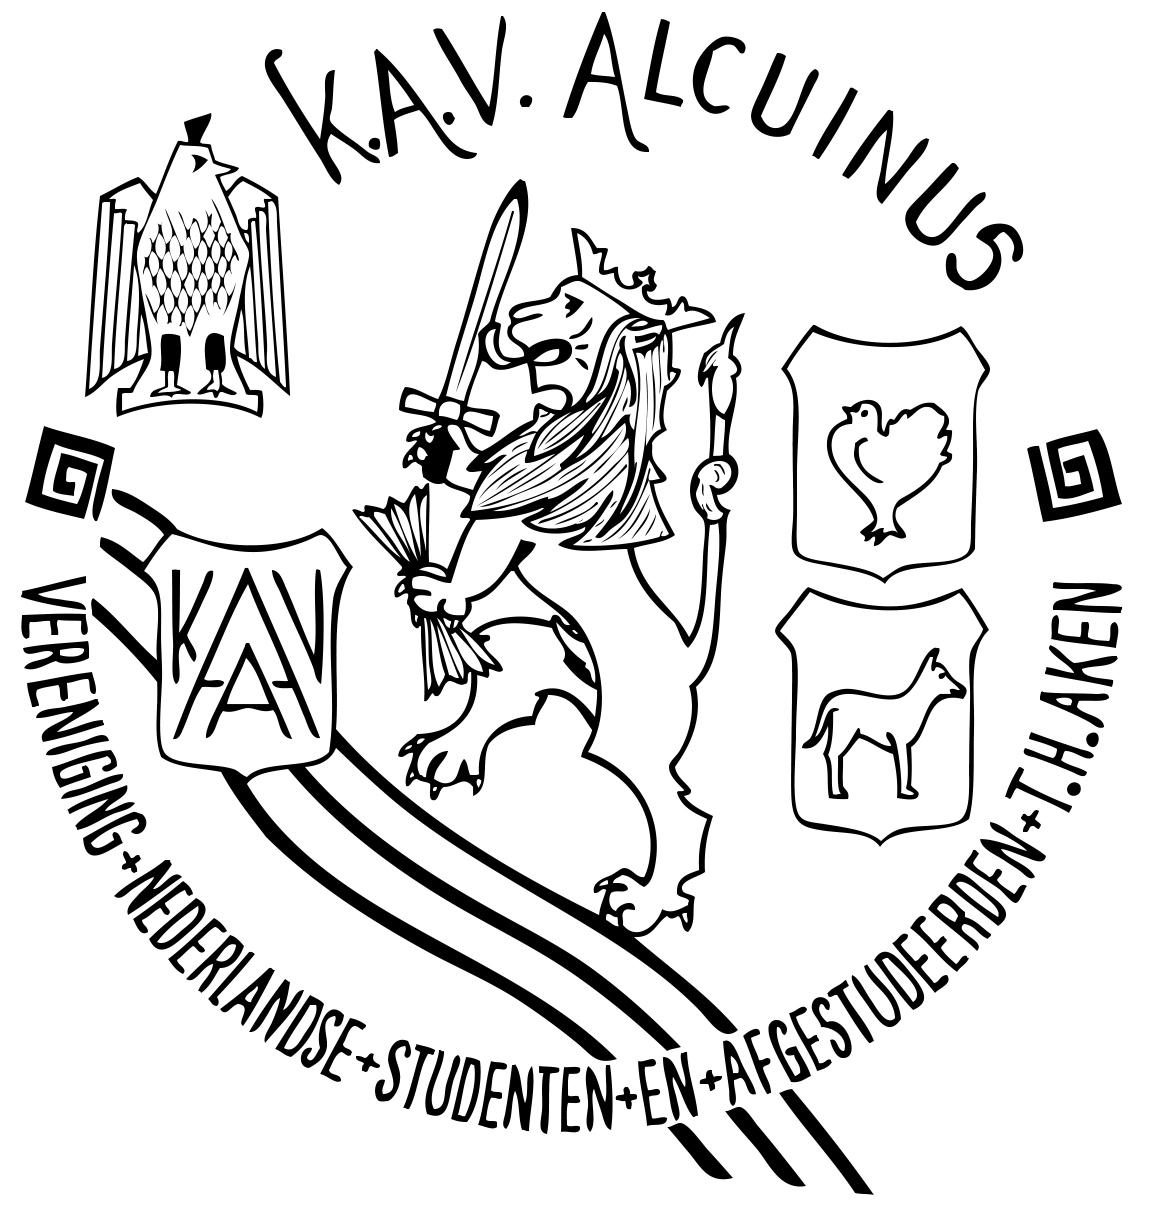 Logo K.A.V. Alcuinus